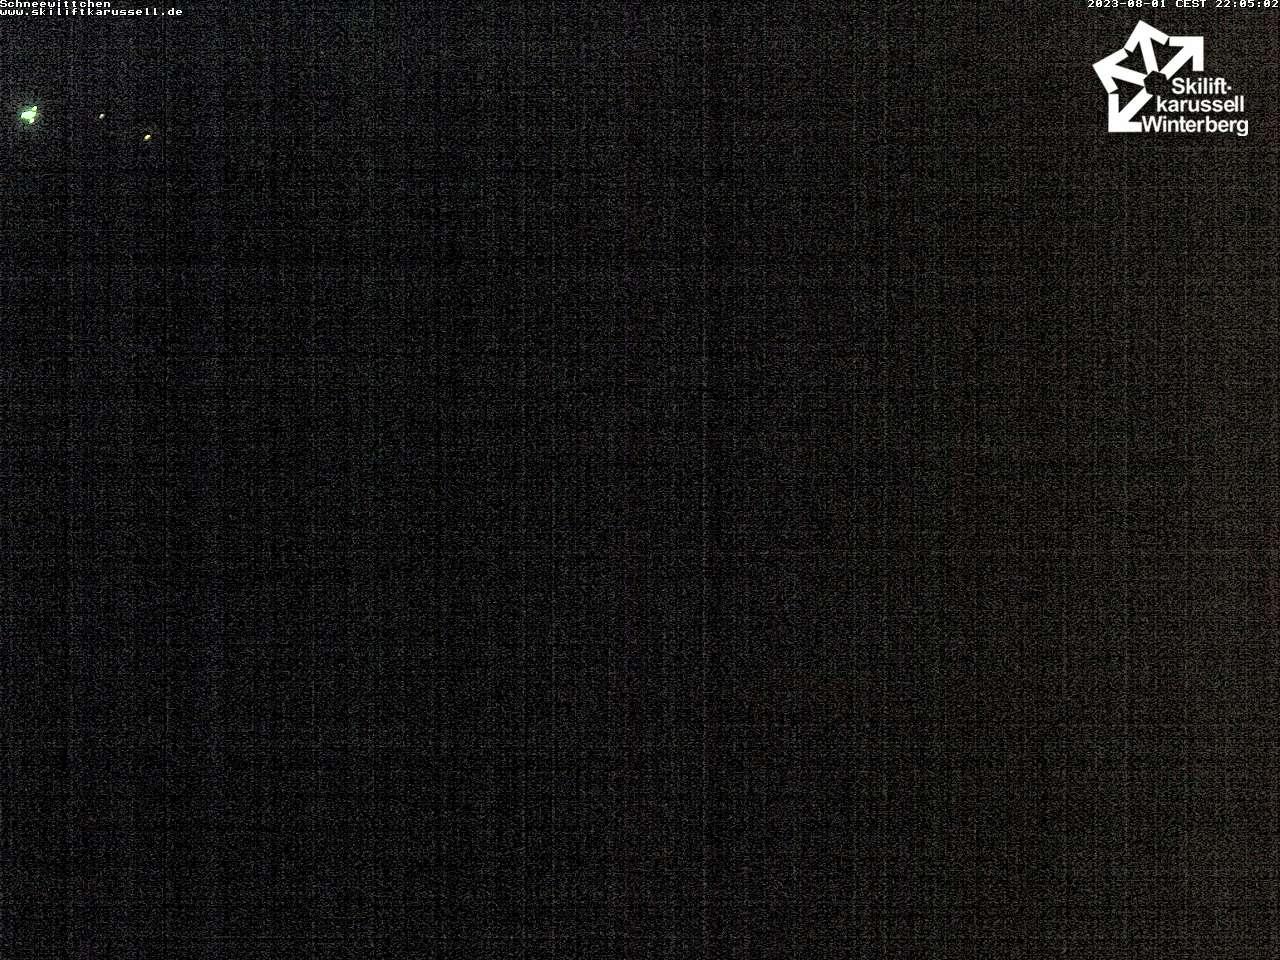 Webcam Schneewittchen - Skiliftkarussell Winterberg